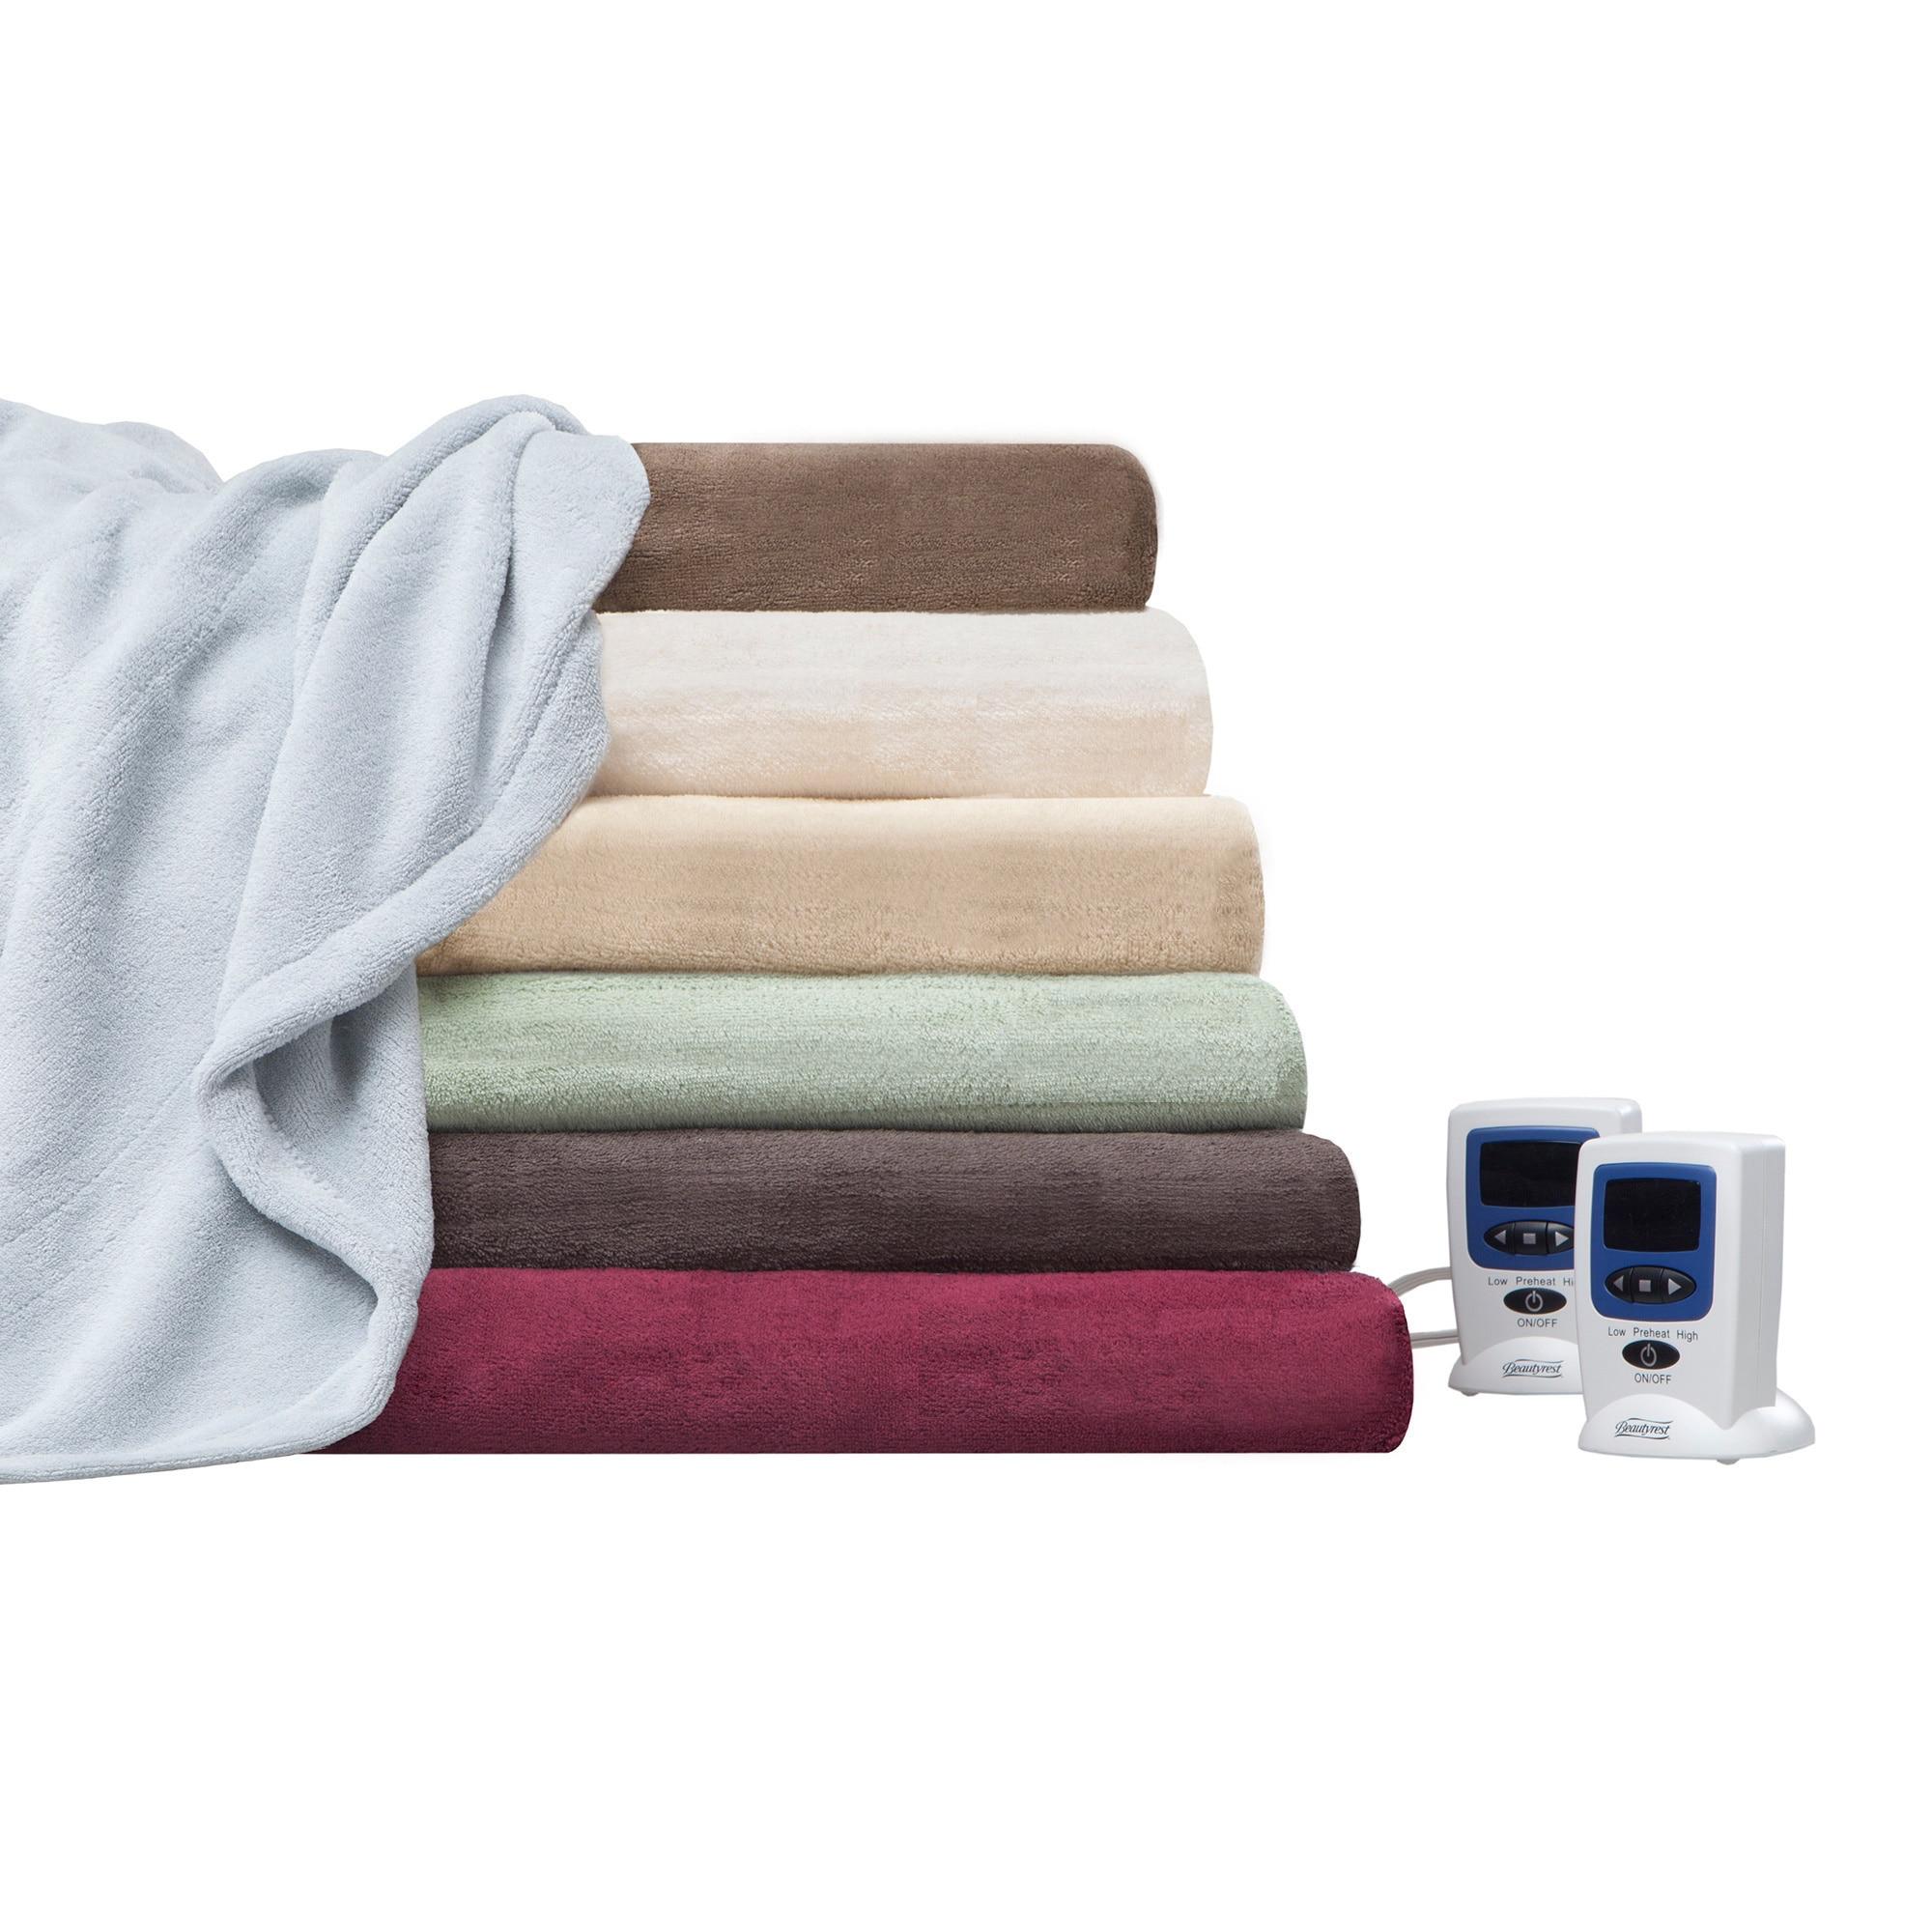 Beautyrest Cozy Plush Heated Electric Blanket Ebay